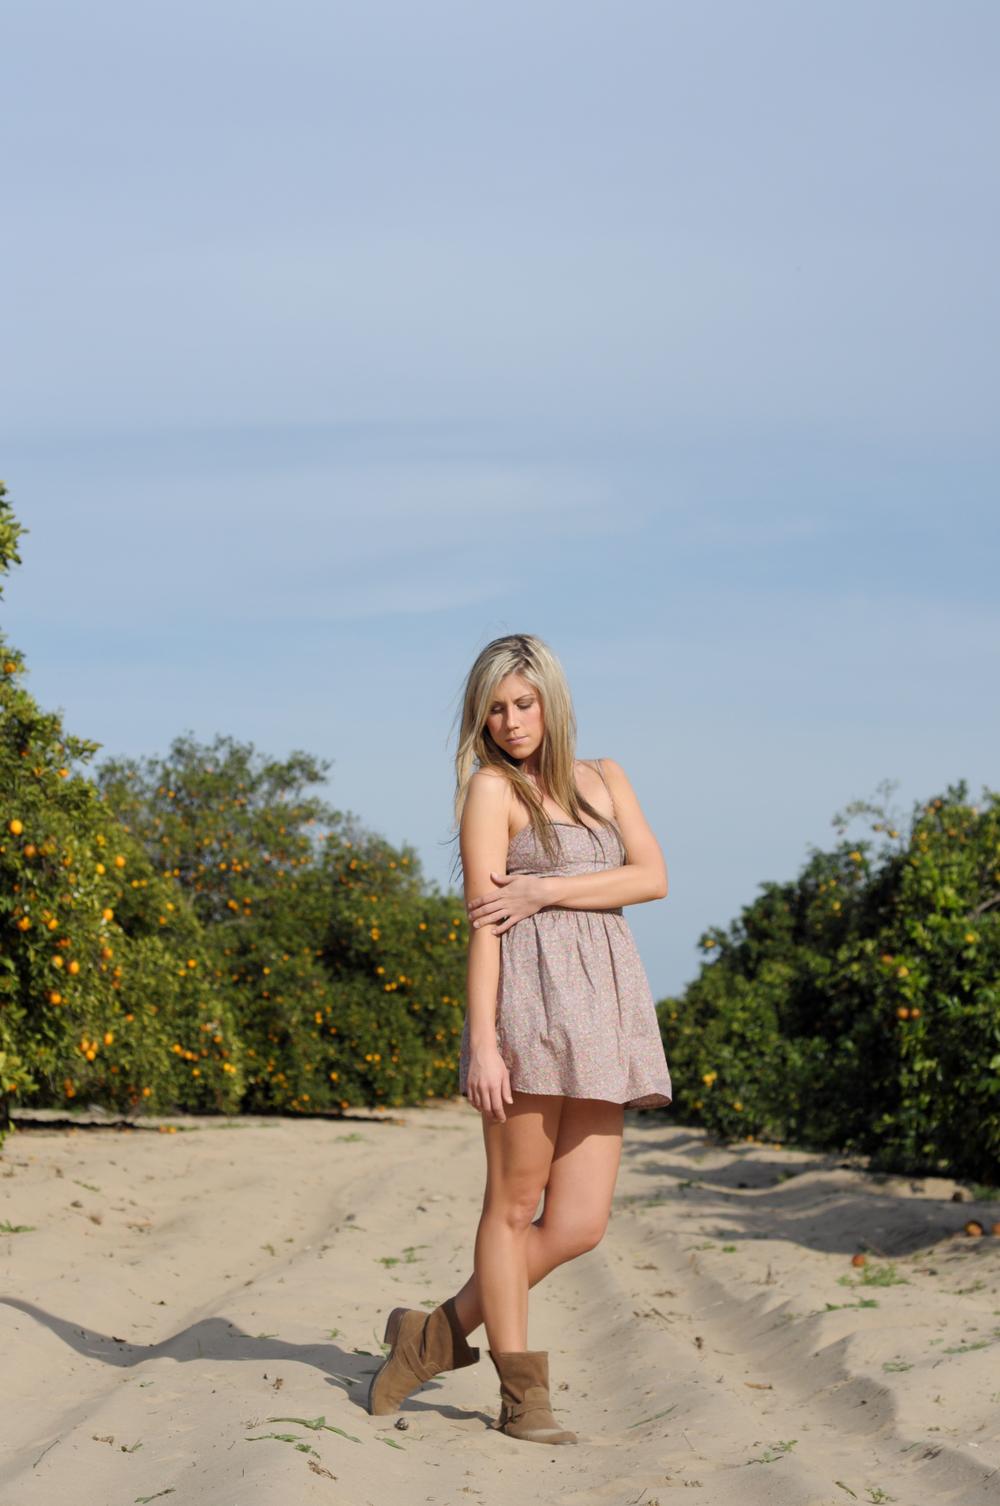 EvelynRPhotography_Cassie-2.jpg